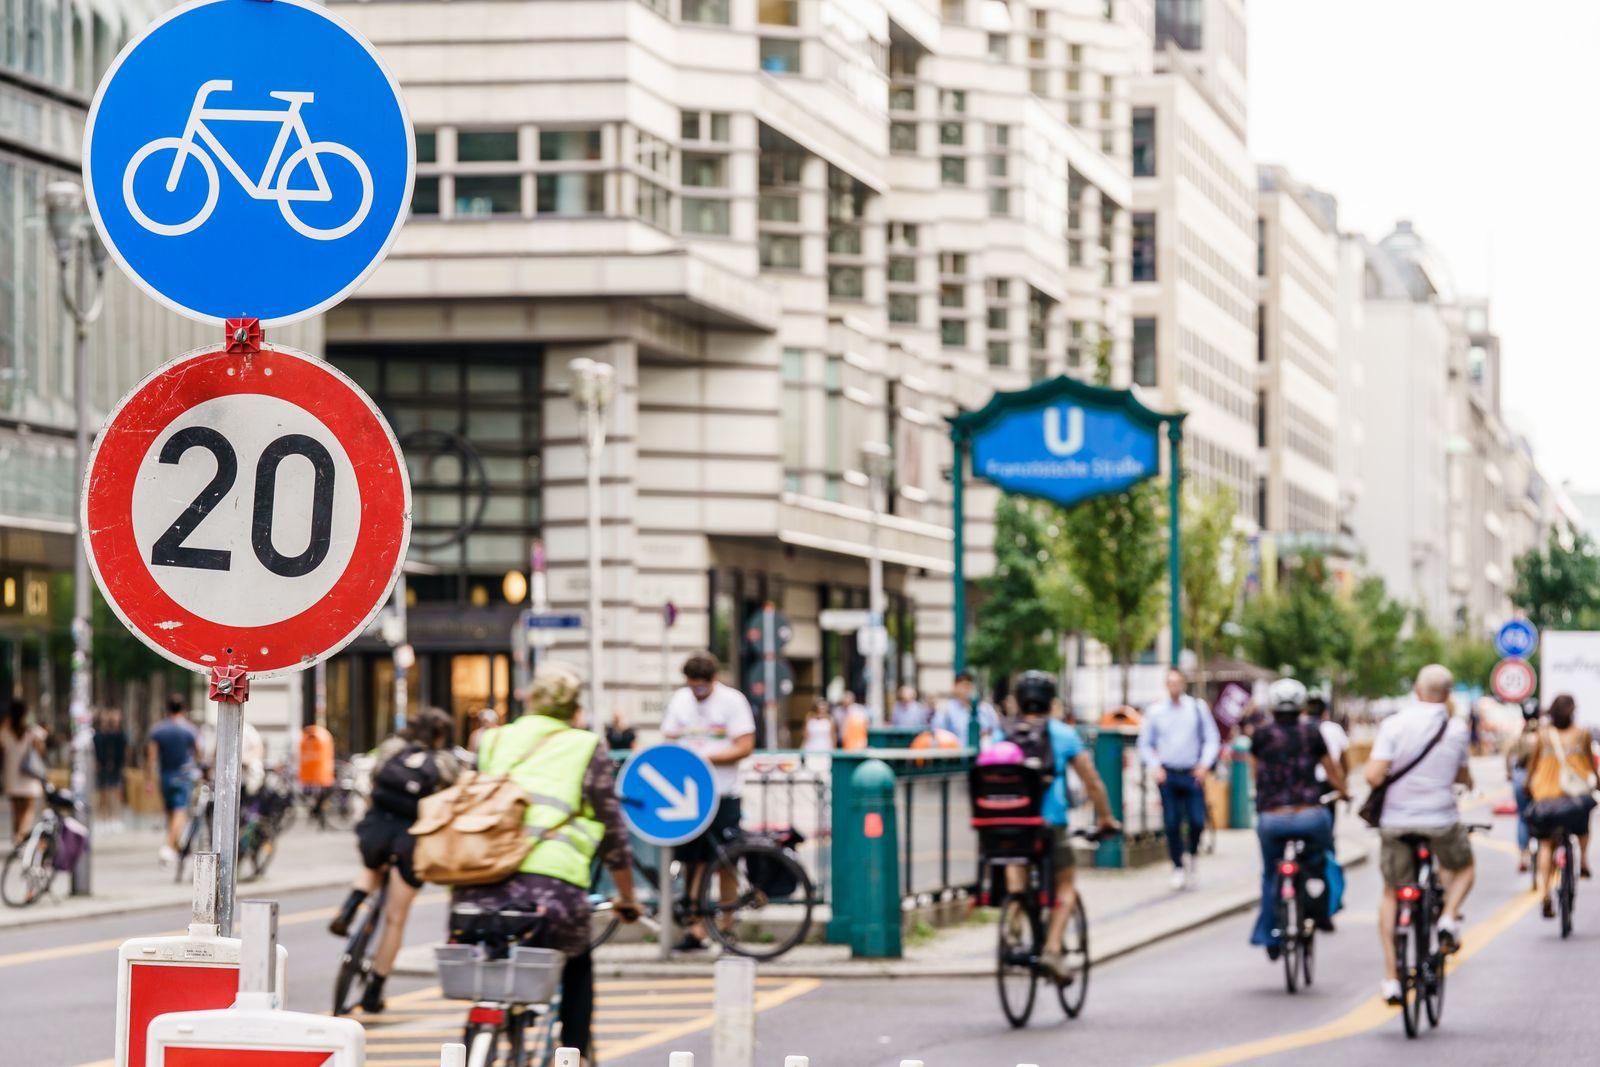 Traffic-reduced Friedrichstrasse shopping street in Berlin, Germany - 16 Sep 2020